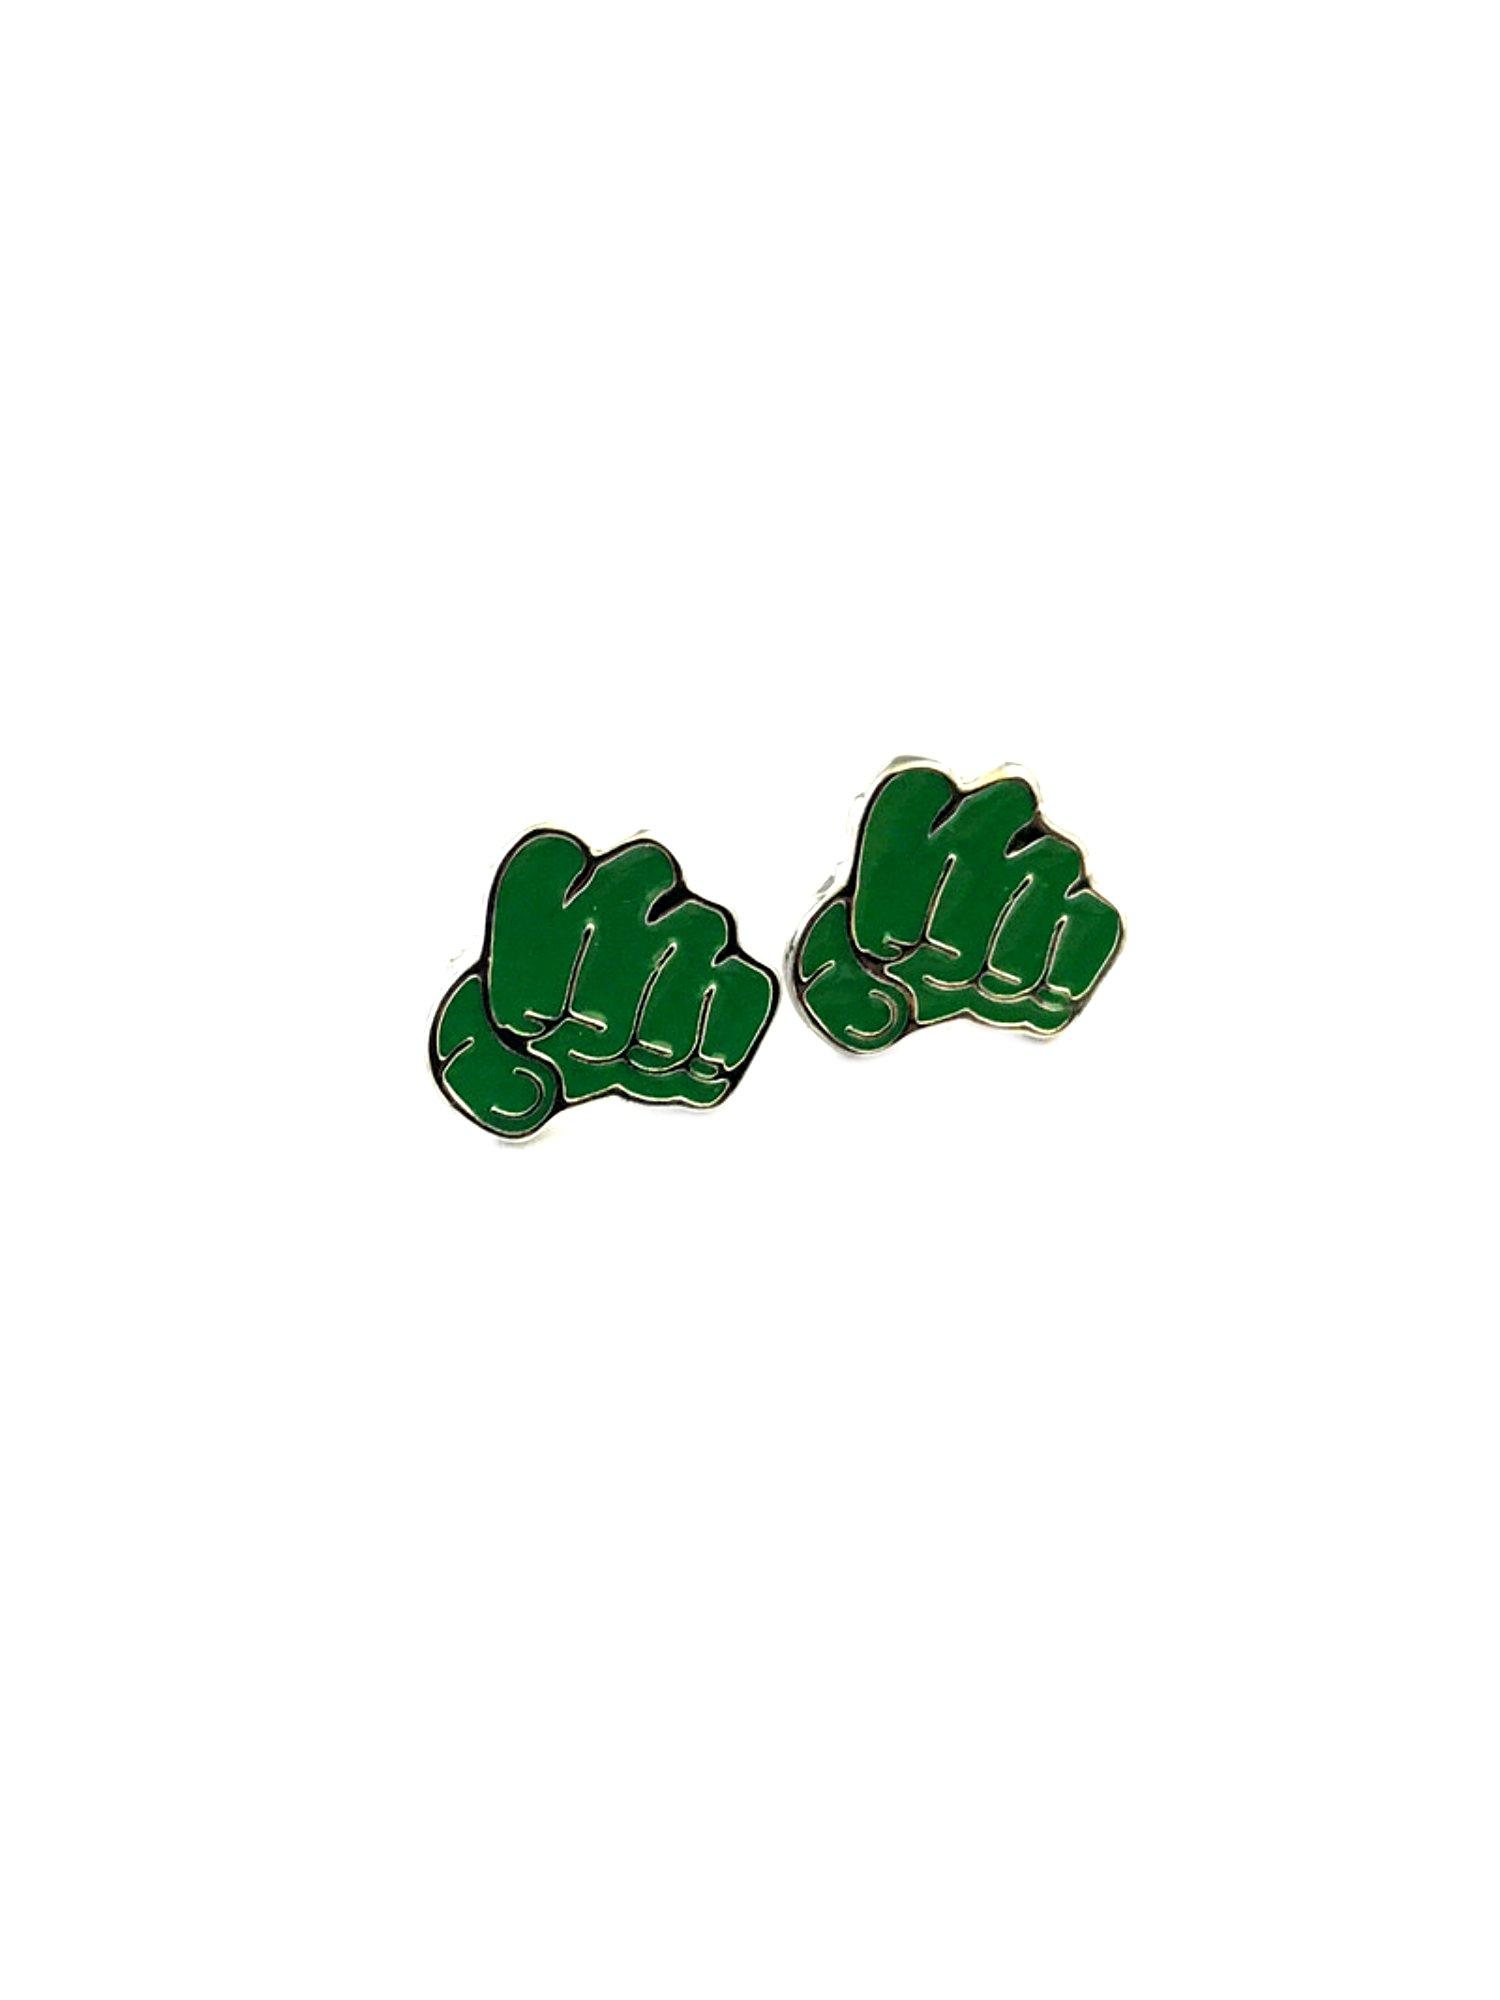 Incredible Hulk Post Stud Earrings Marvel Comics 2018 Movies Avengers Infinity War Cartoon Superhero Logo Theme Premium Quality Detailed Cosplay Jewelry Gift Series